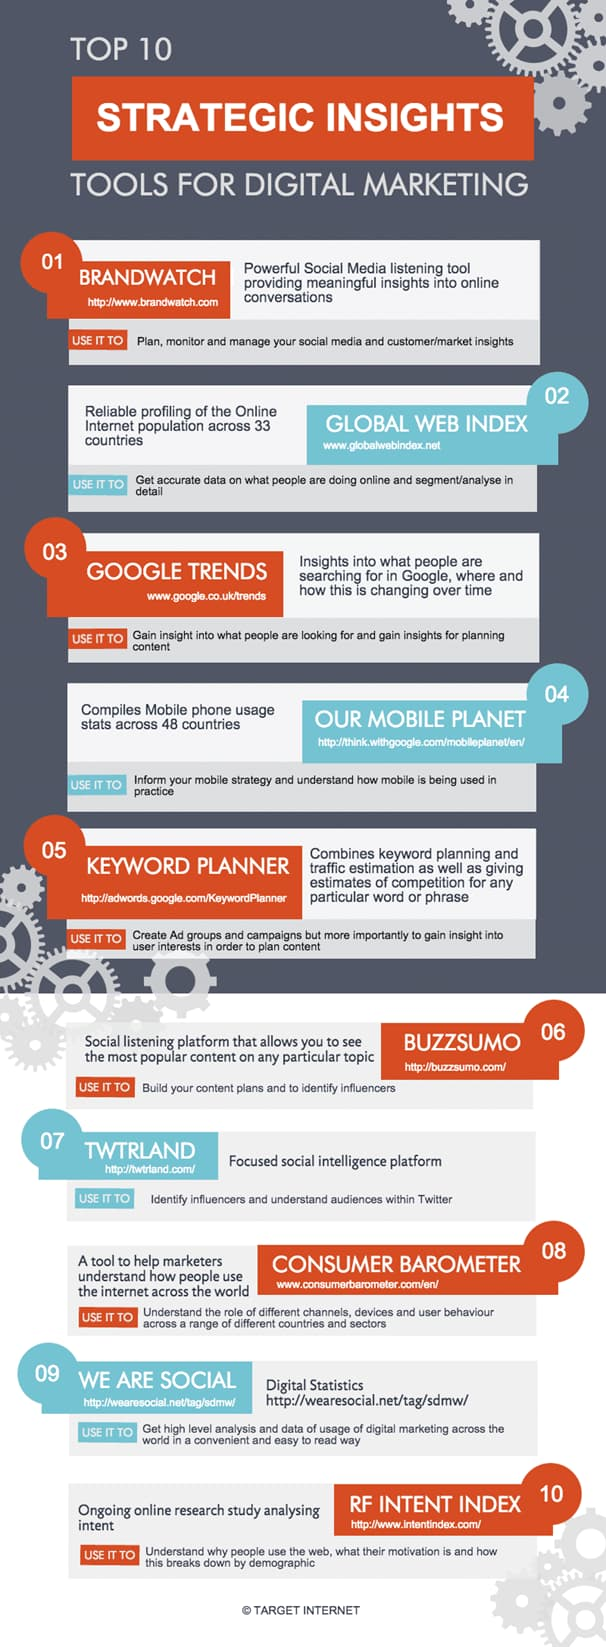 Top 10 Strategic Insights Tools for Digital Marketing